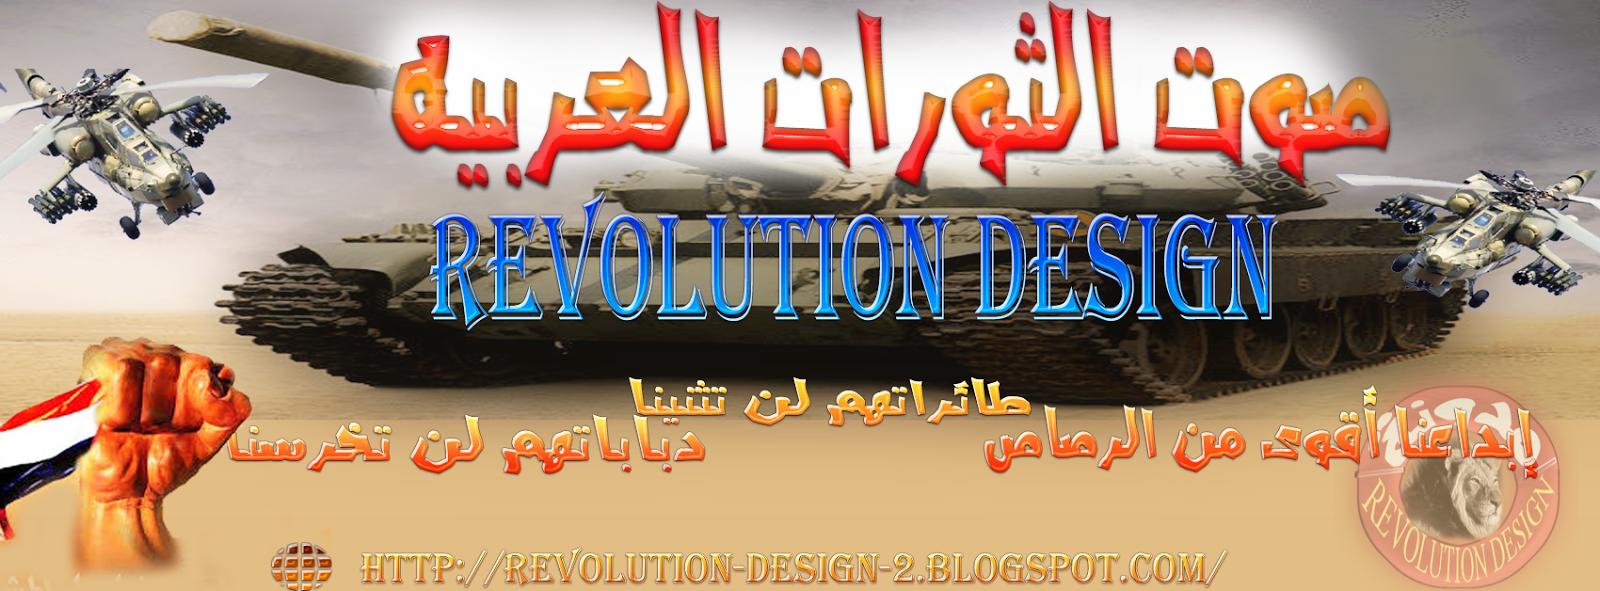 ���� ����  revolution design��� ����� ��� ����� �������� ������